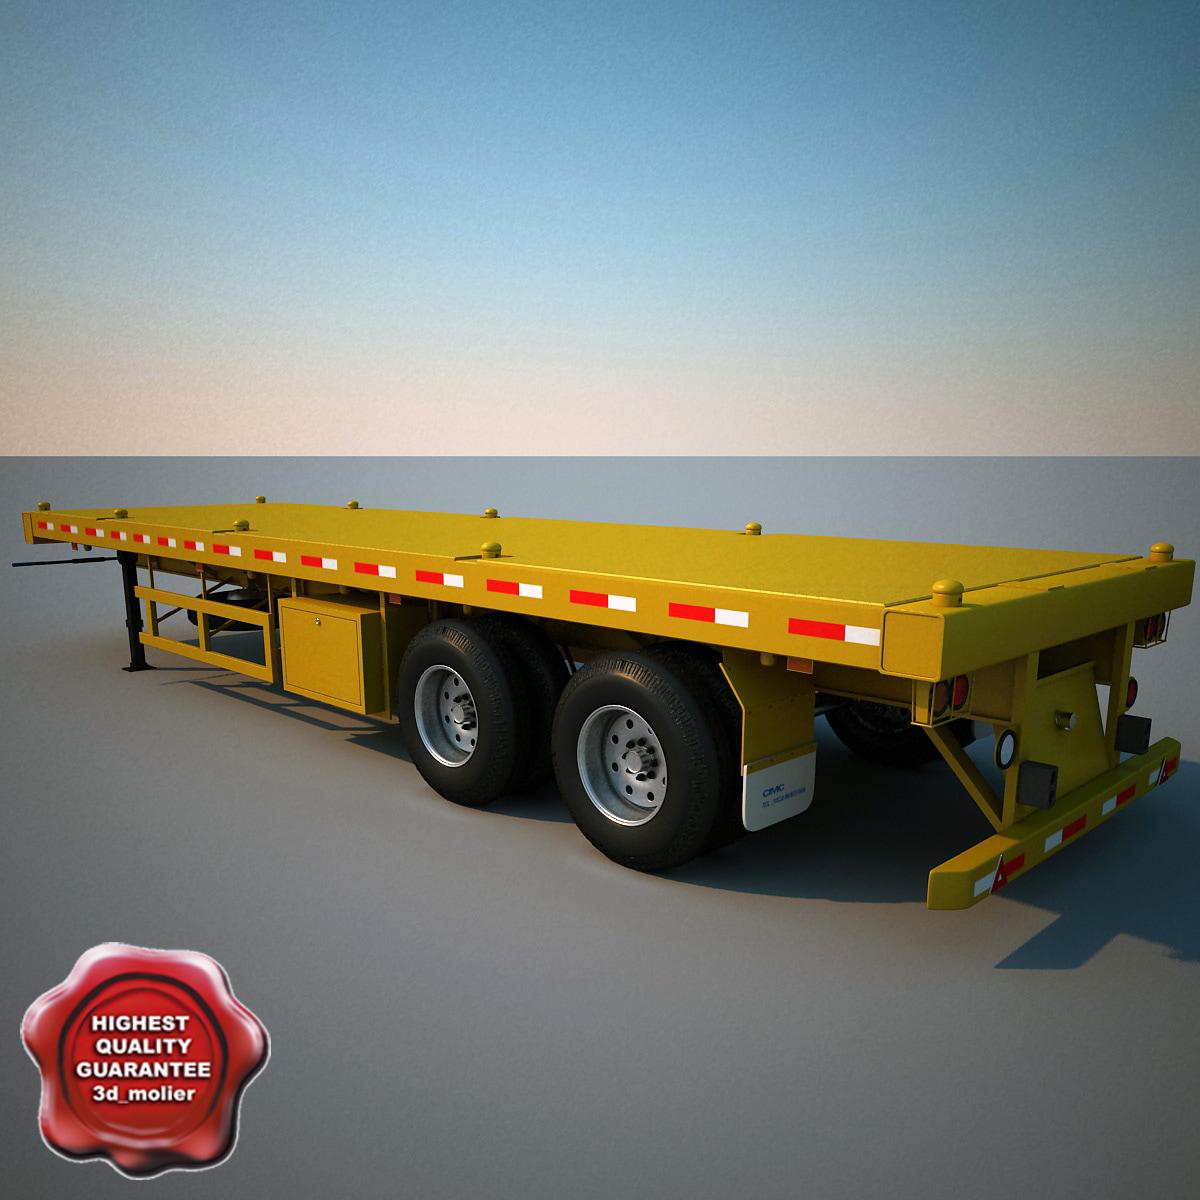 Container_Semi_Trailer_00.jpg